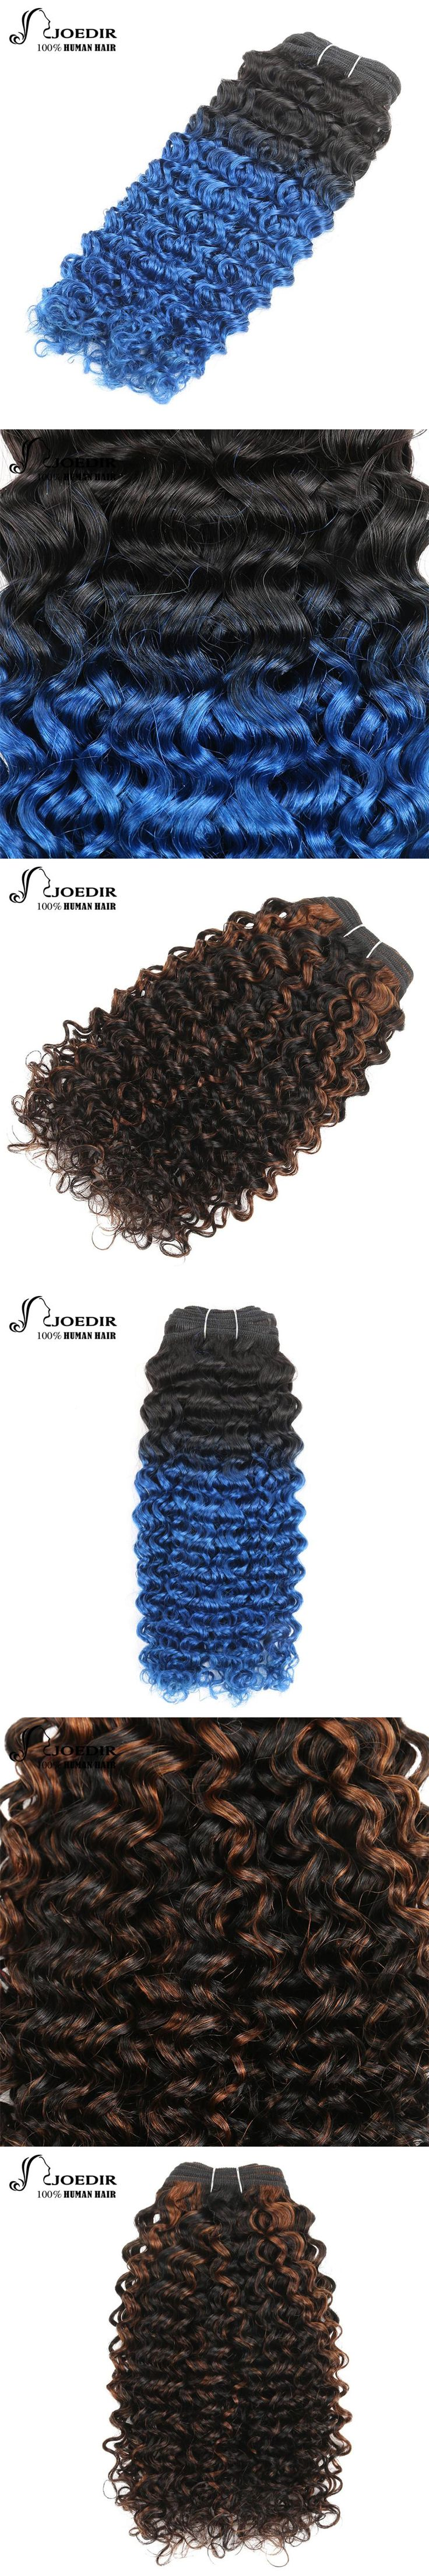 Joedir Hair Pre-Colored Brazilian Remy Human Hair Weave Natural Dream Curl #P1B 30 Color T1B Blue Hair Bundles Deal Can Buy 3/4